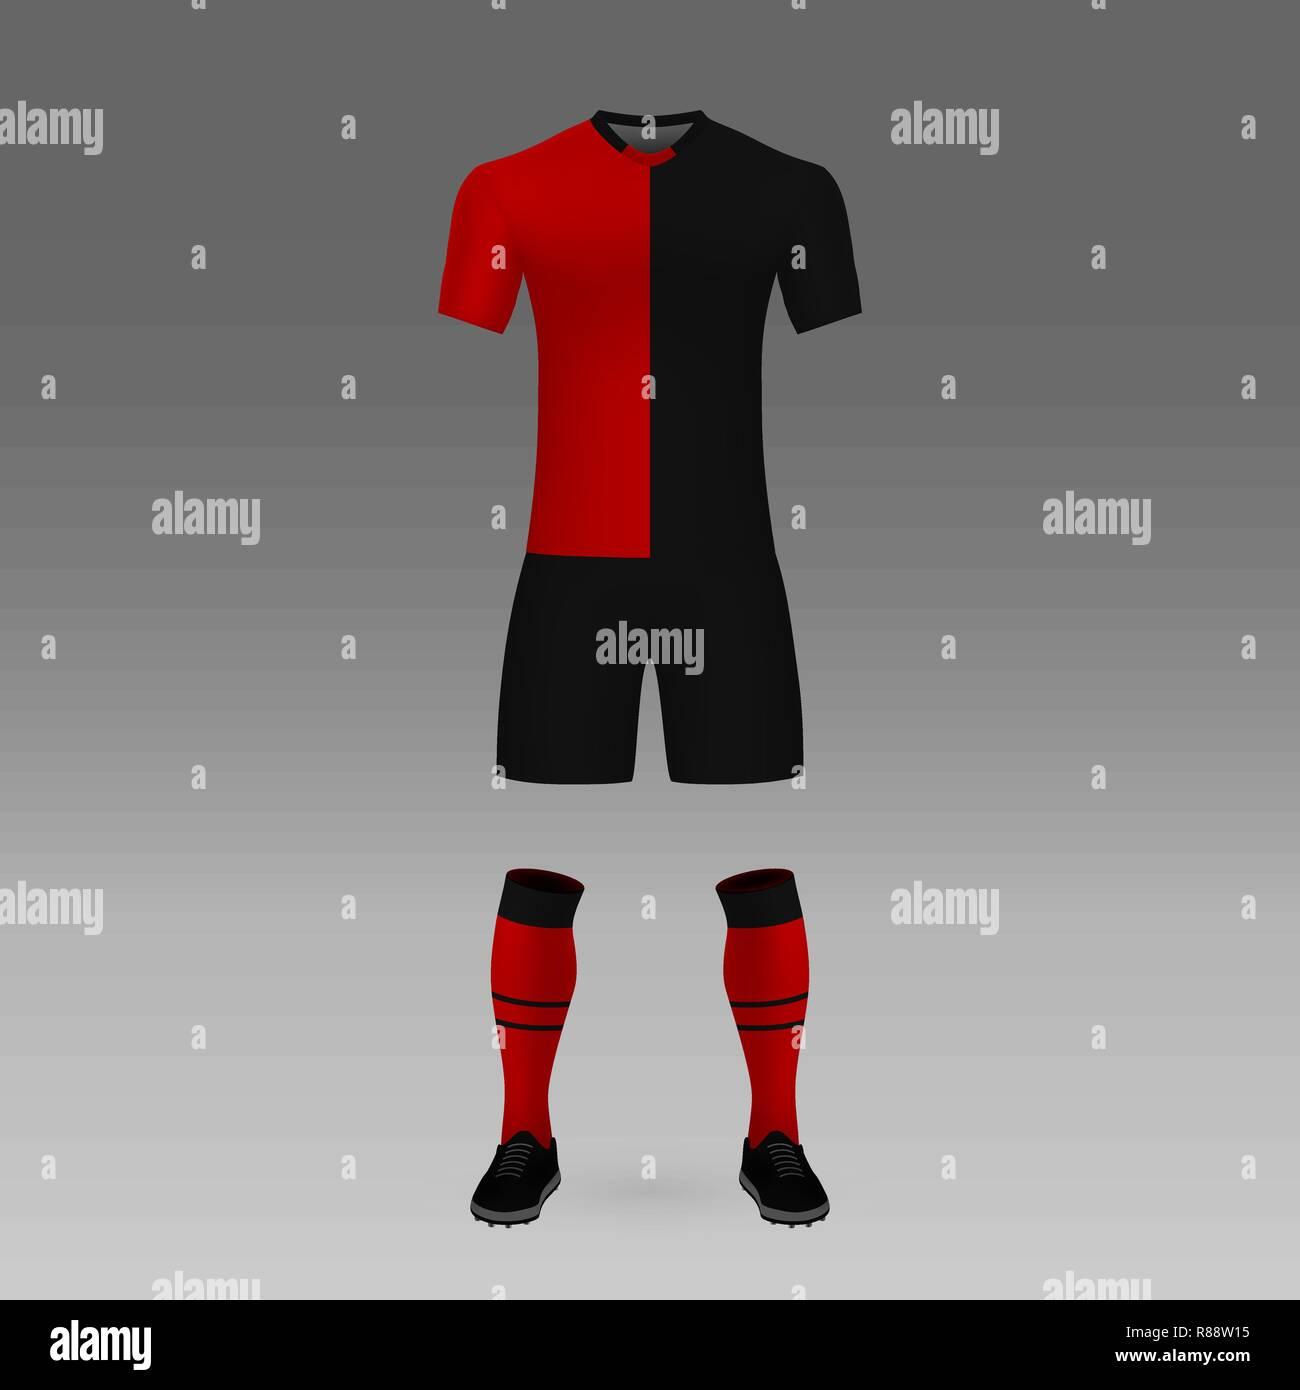 on sale 3e05e b0f0a football kit Newell's Old Boys, shirt template for soccer ...